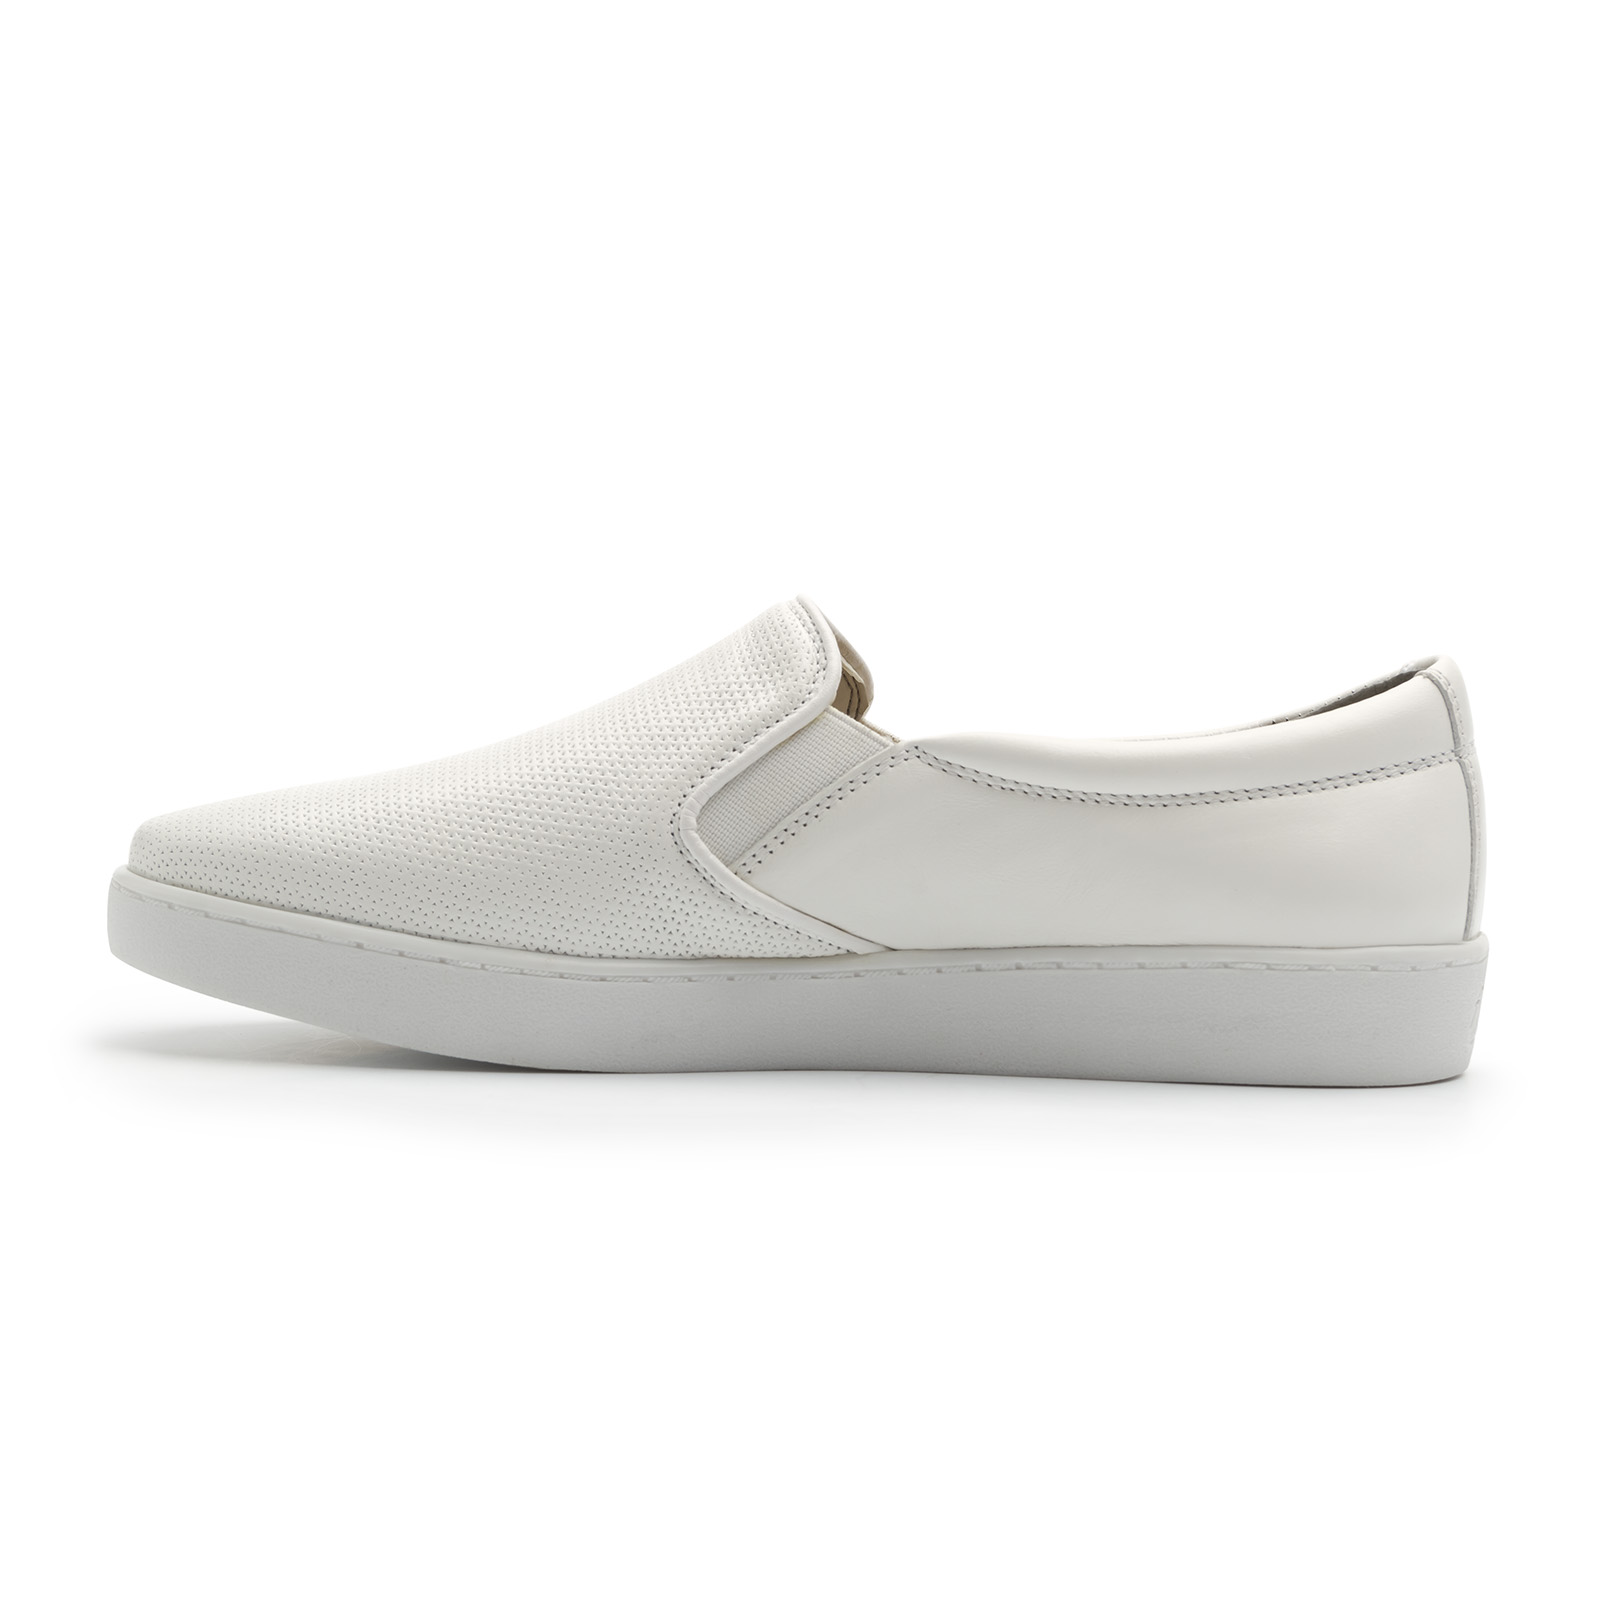 Zapatos blancos formales Softaise para mujer NFHKOPp2q